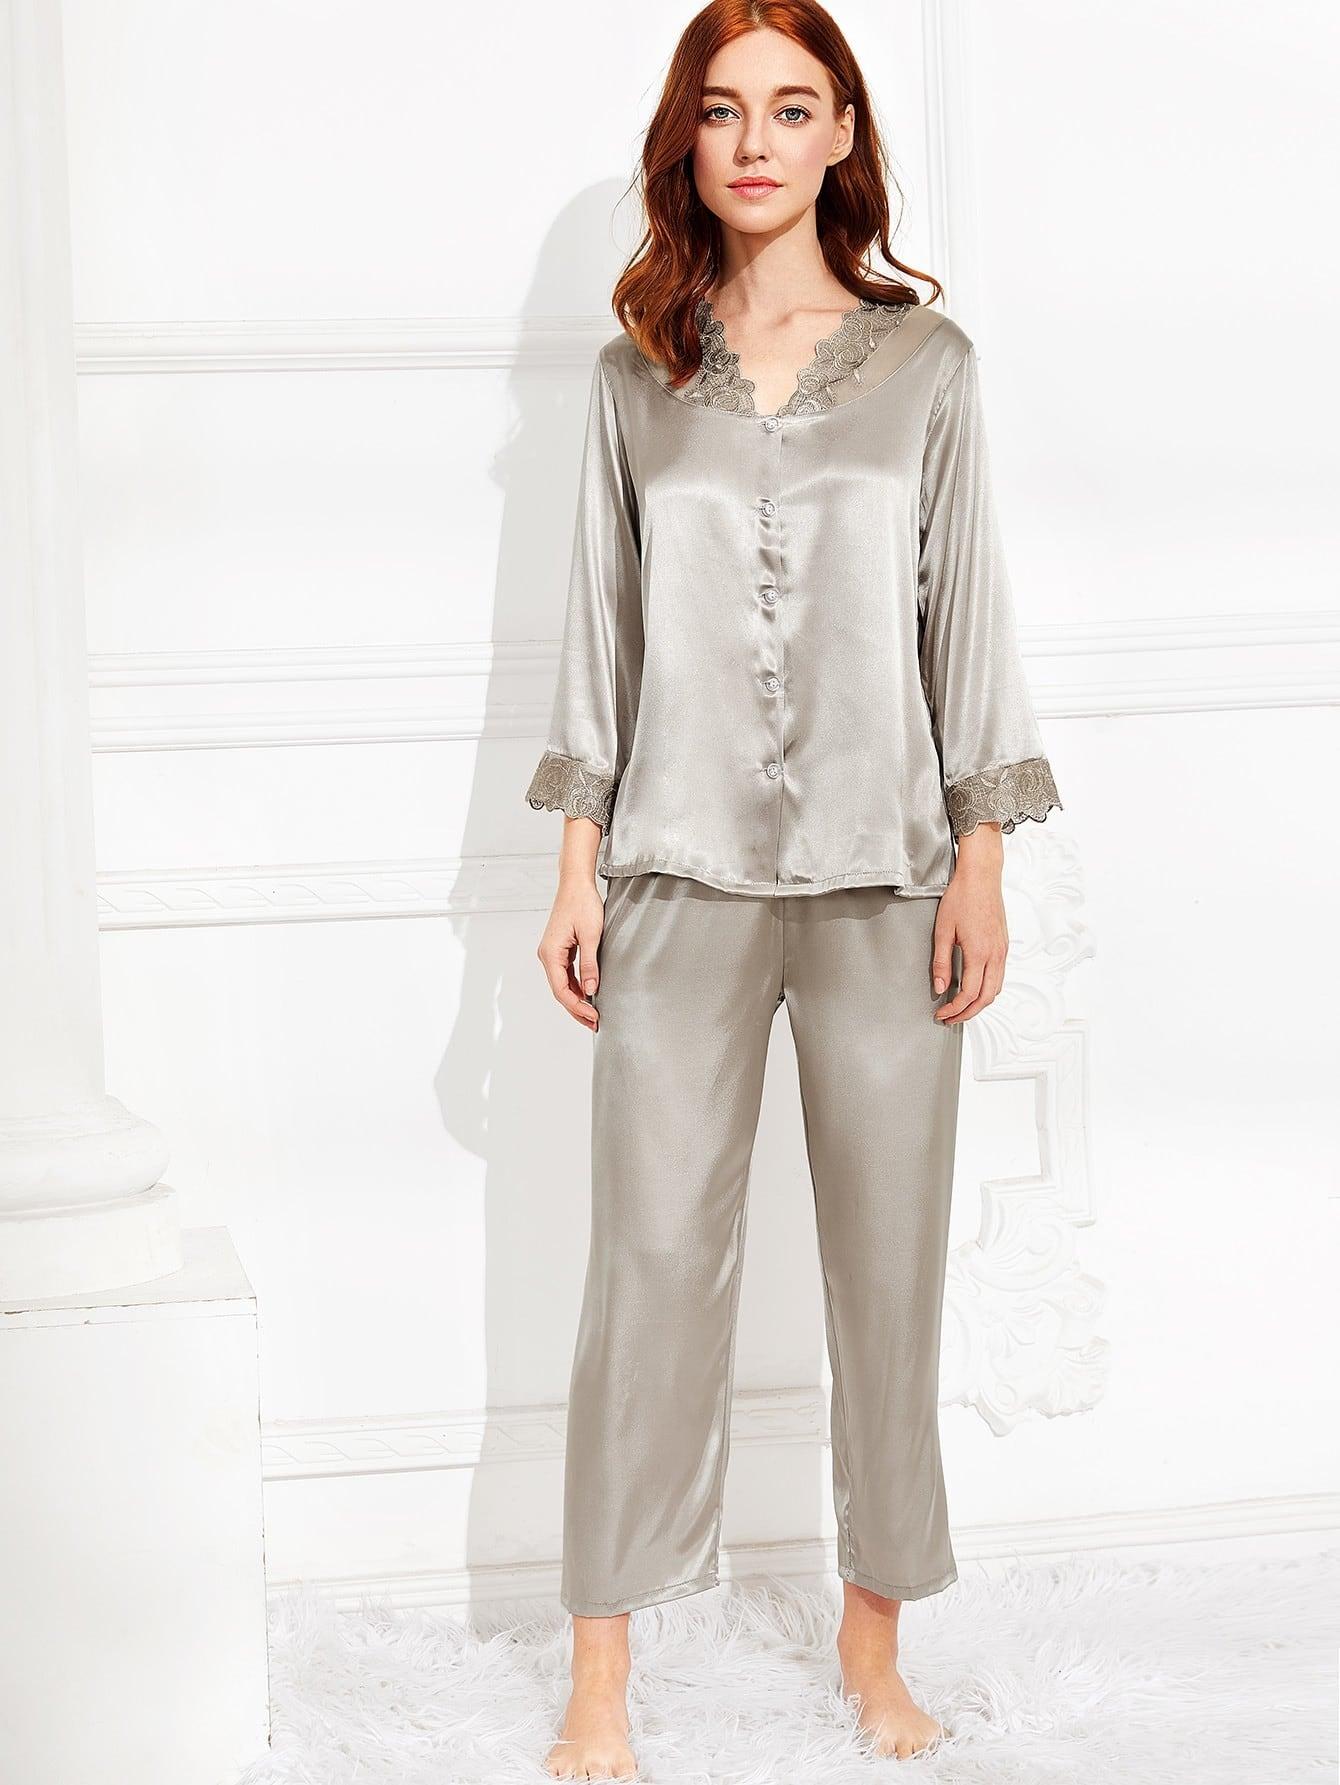 Embroidered Lace Trim Satin Pajama Set satin scallop lace trim cami pajama set